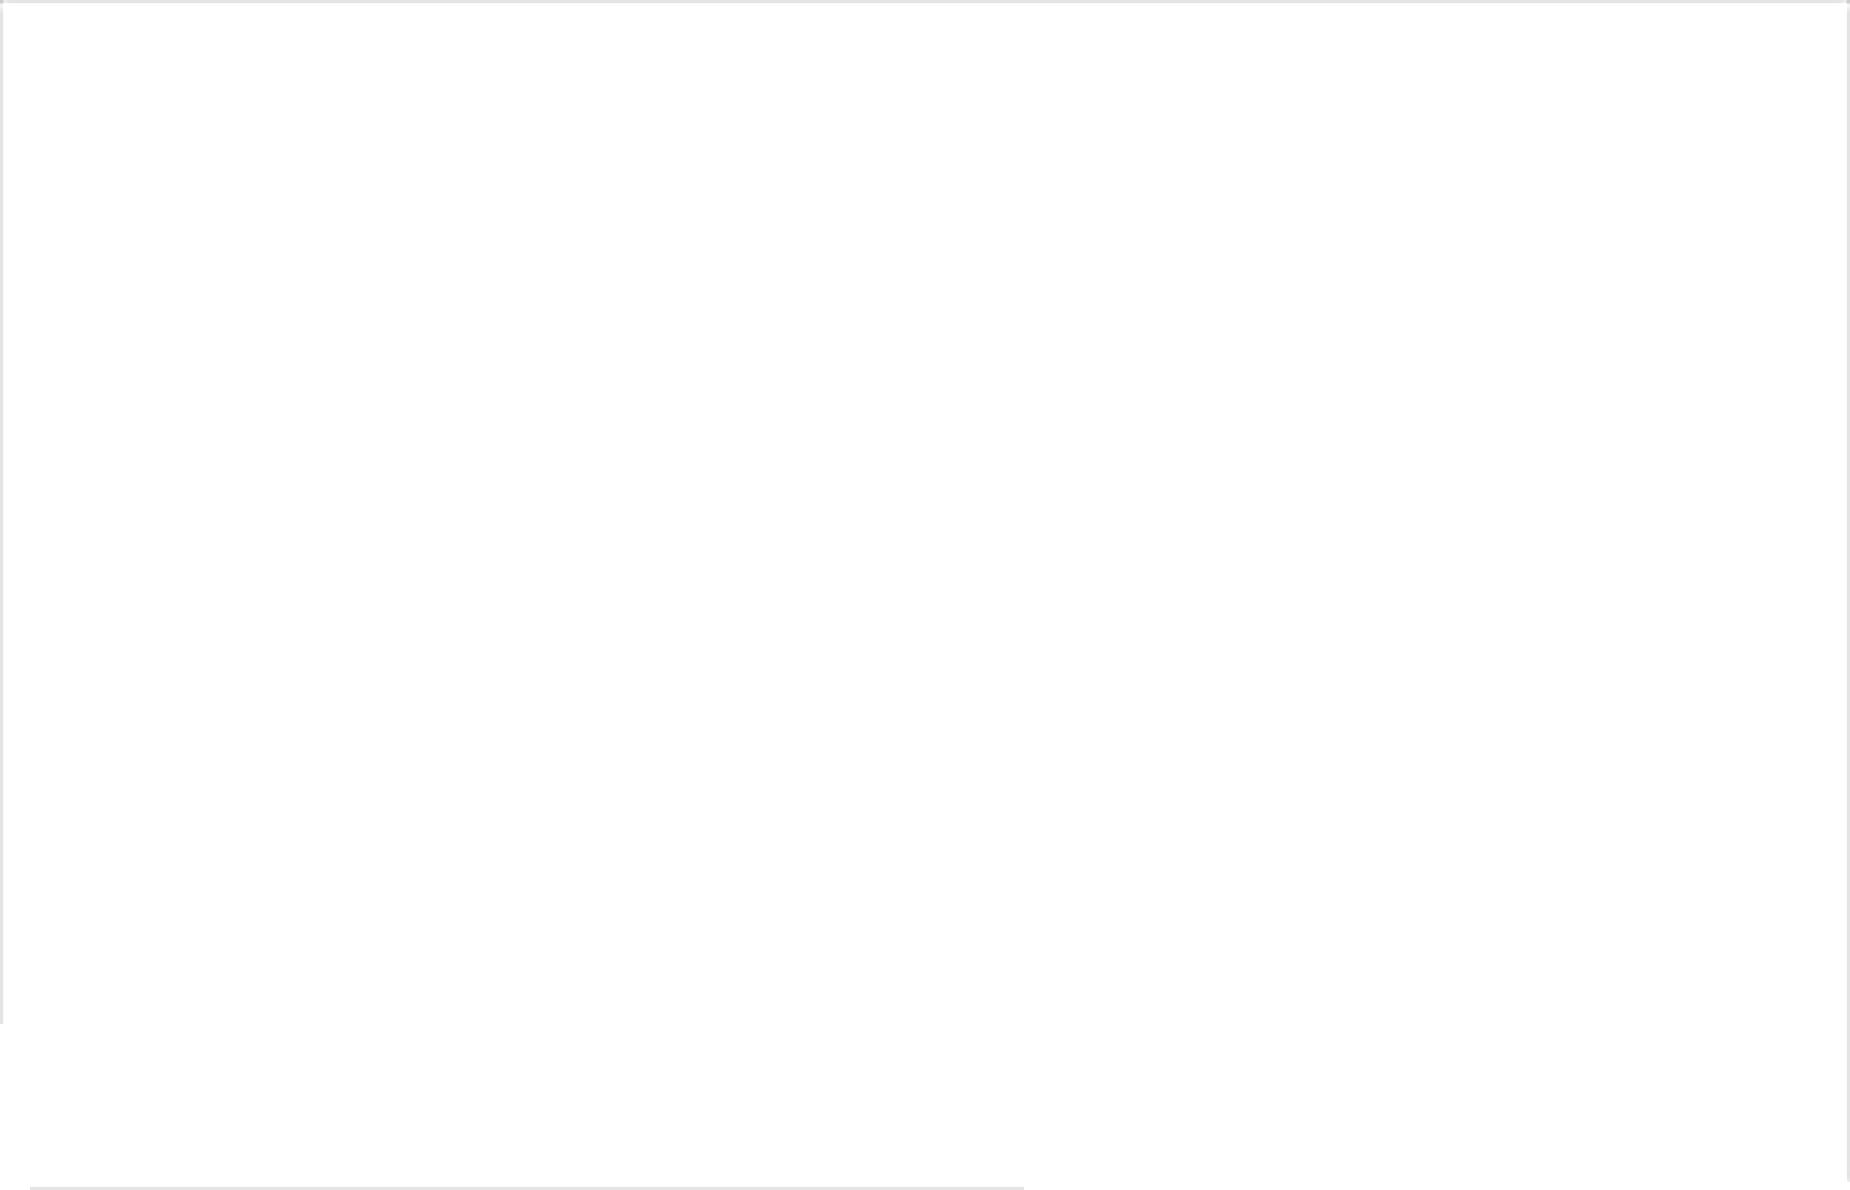 Edimurtra SA